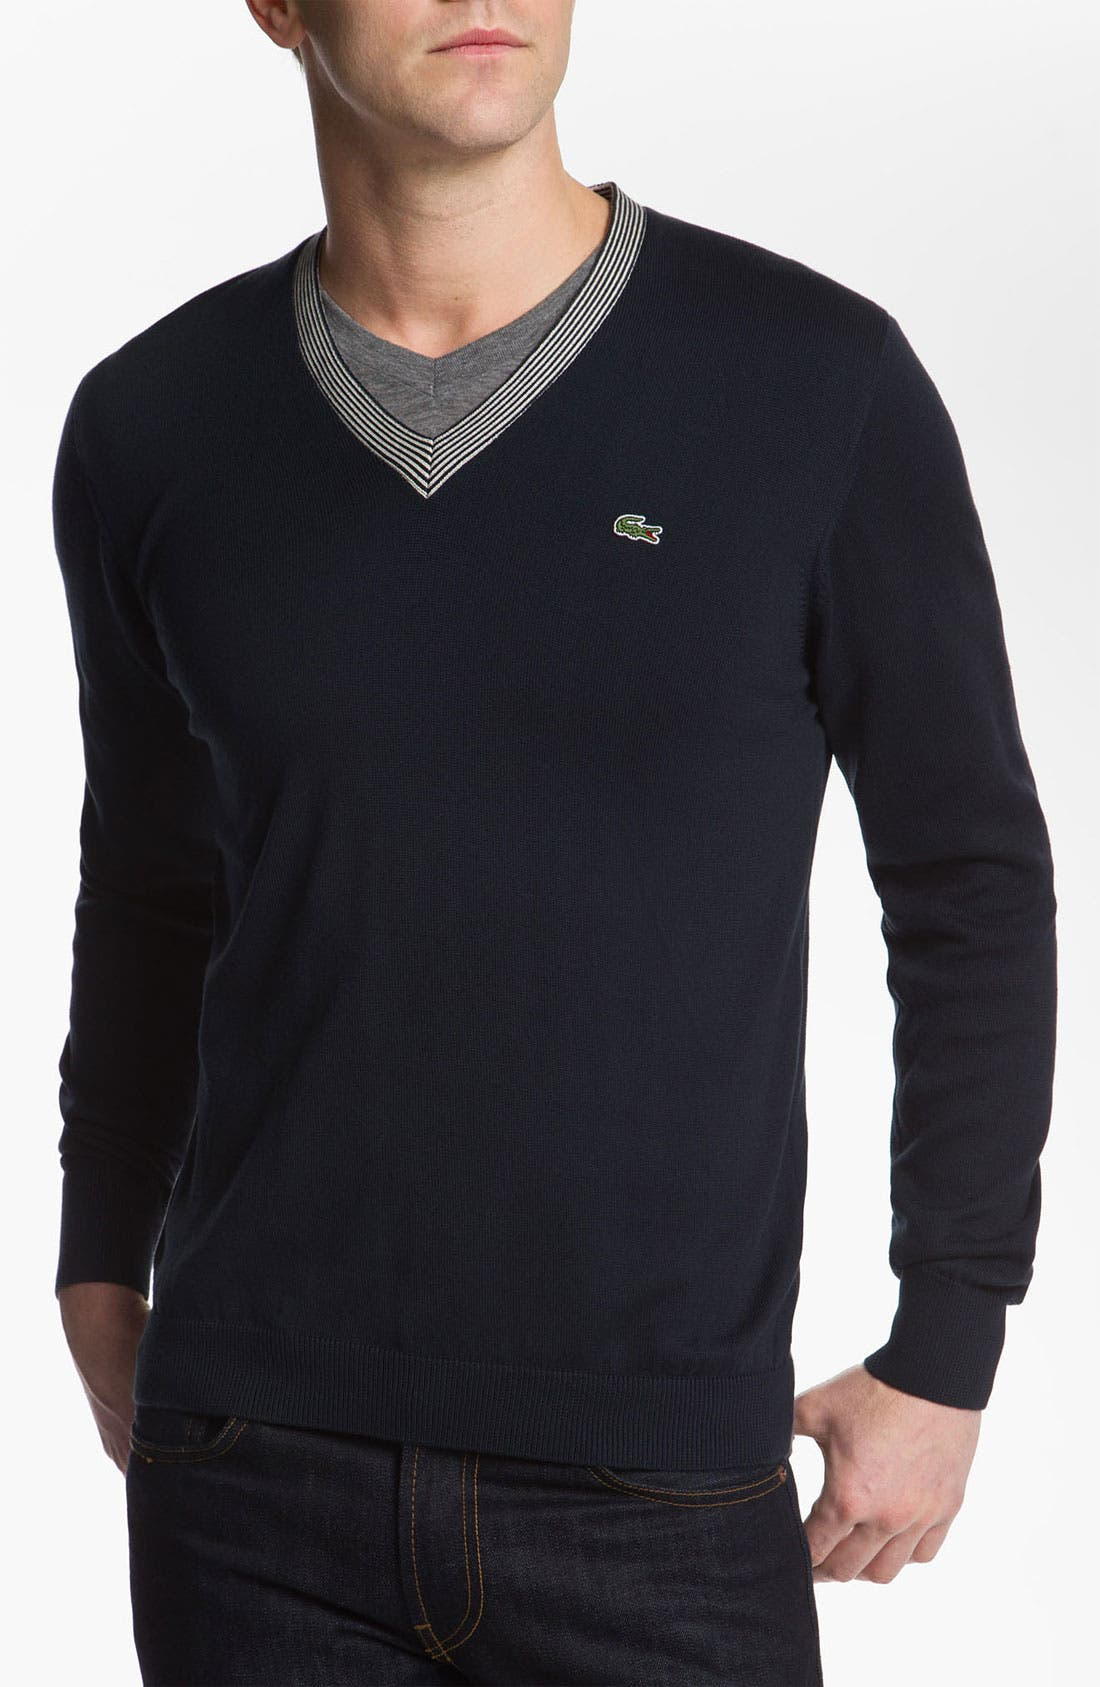 Alternate Image 1 Selected - Lacoste V-Neck Sweater